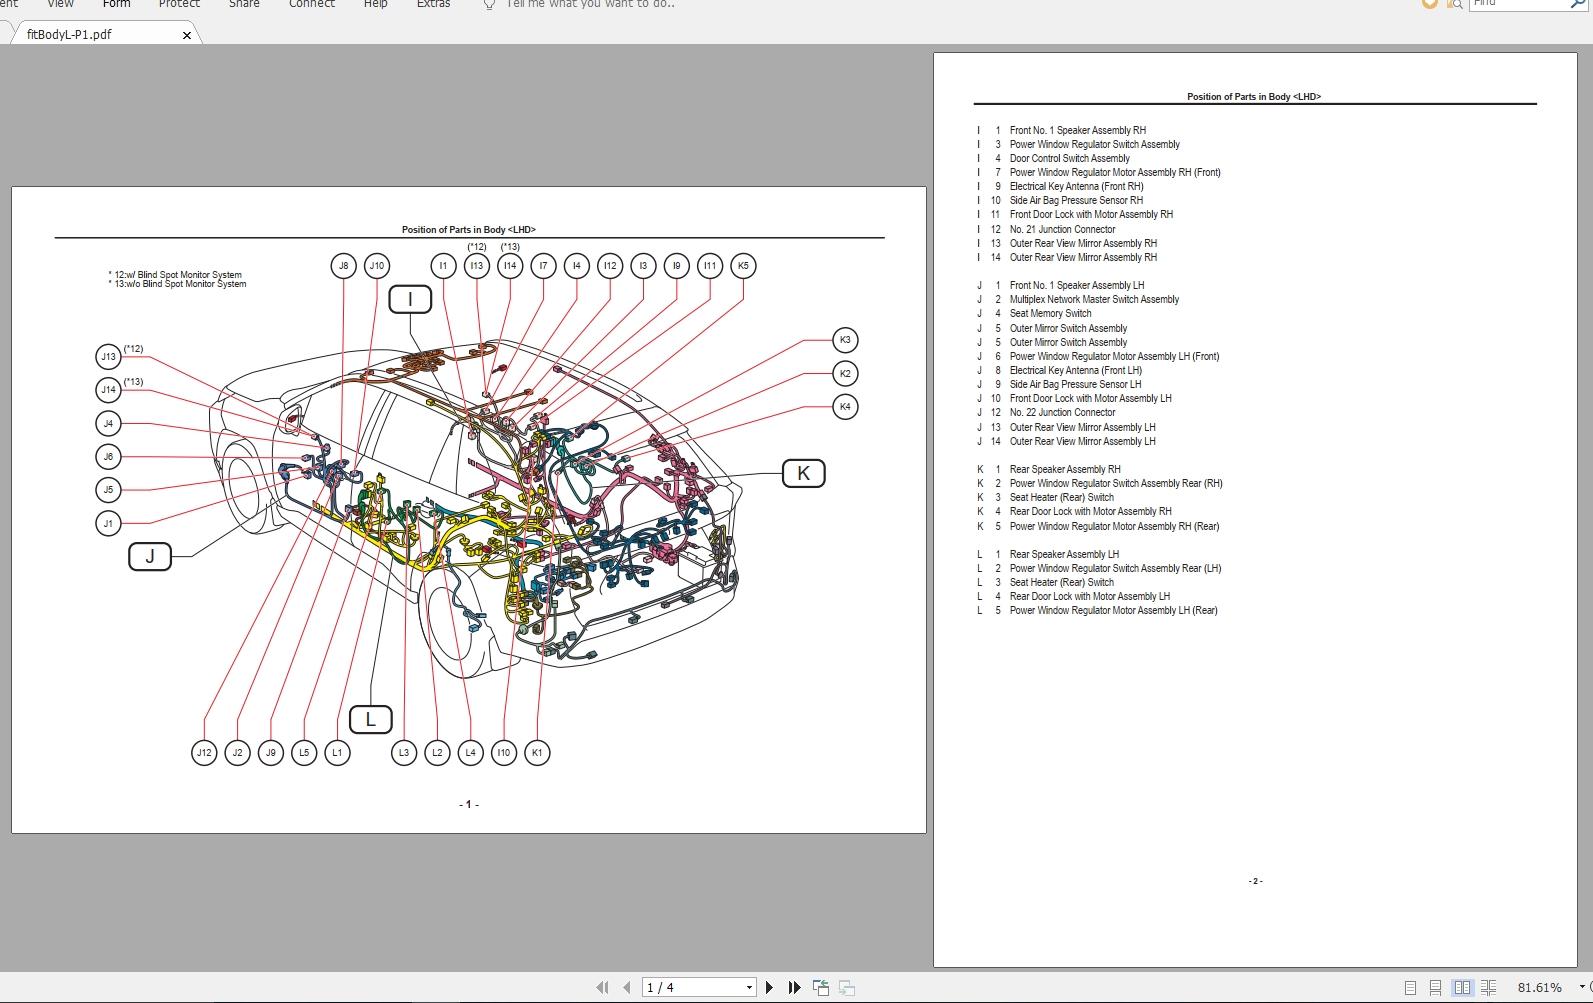 Toyota Avensis Wiring Diagram Full Hd Quality Version Wiring Diagram Triangular Diagrams Emballages Sous Vide Fr